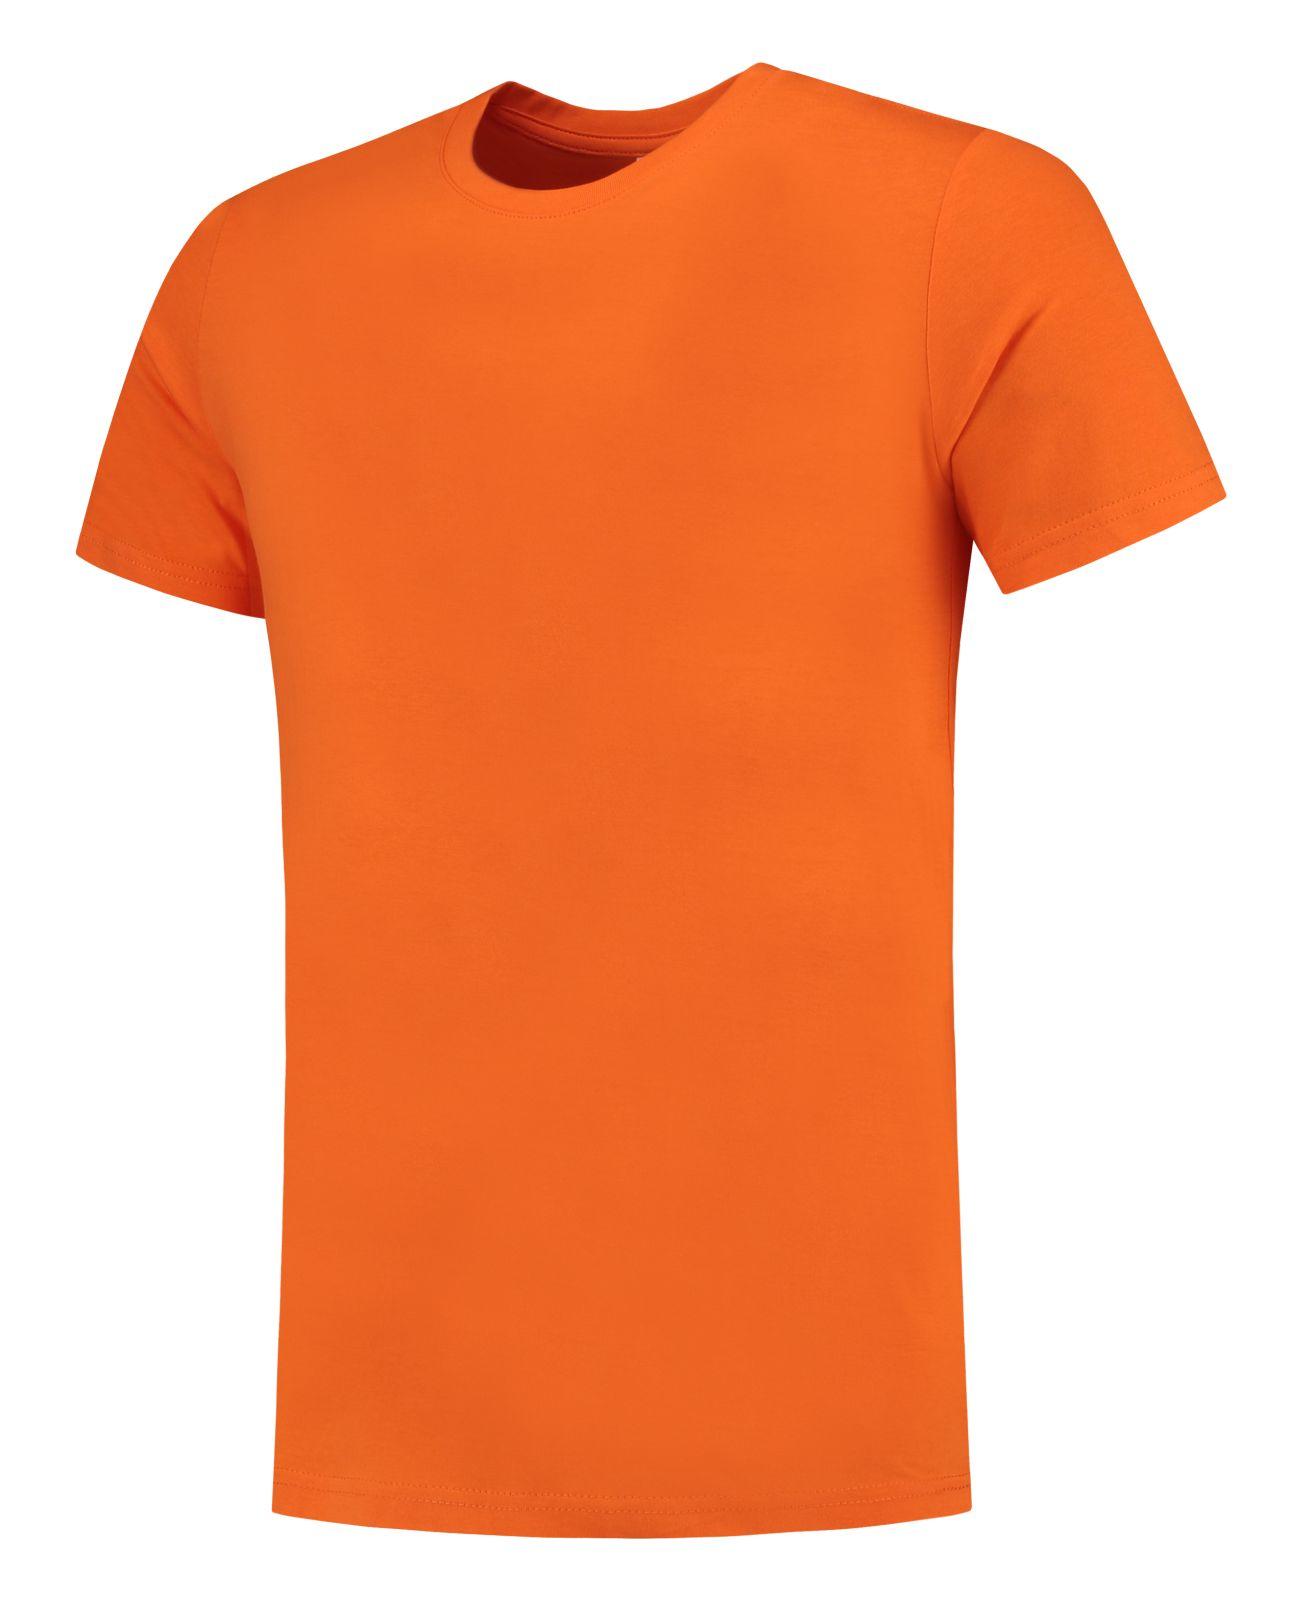 Tricorp Casual Kinderkleding T-shirts 101014-TFR160 oranje(Orange)